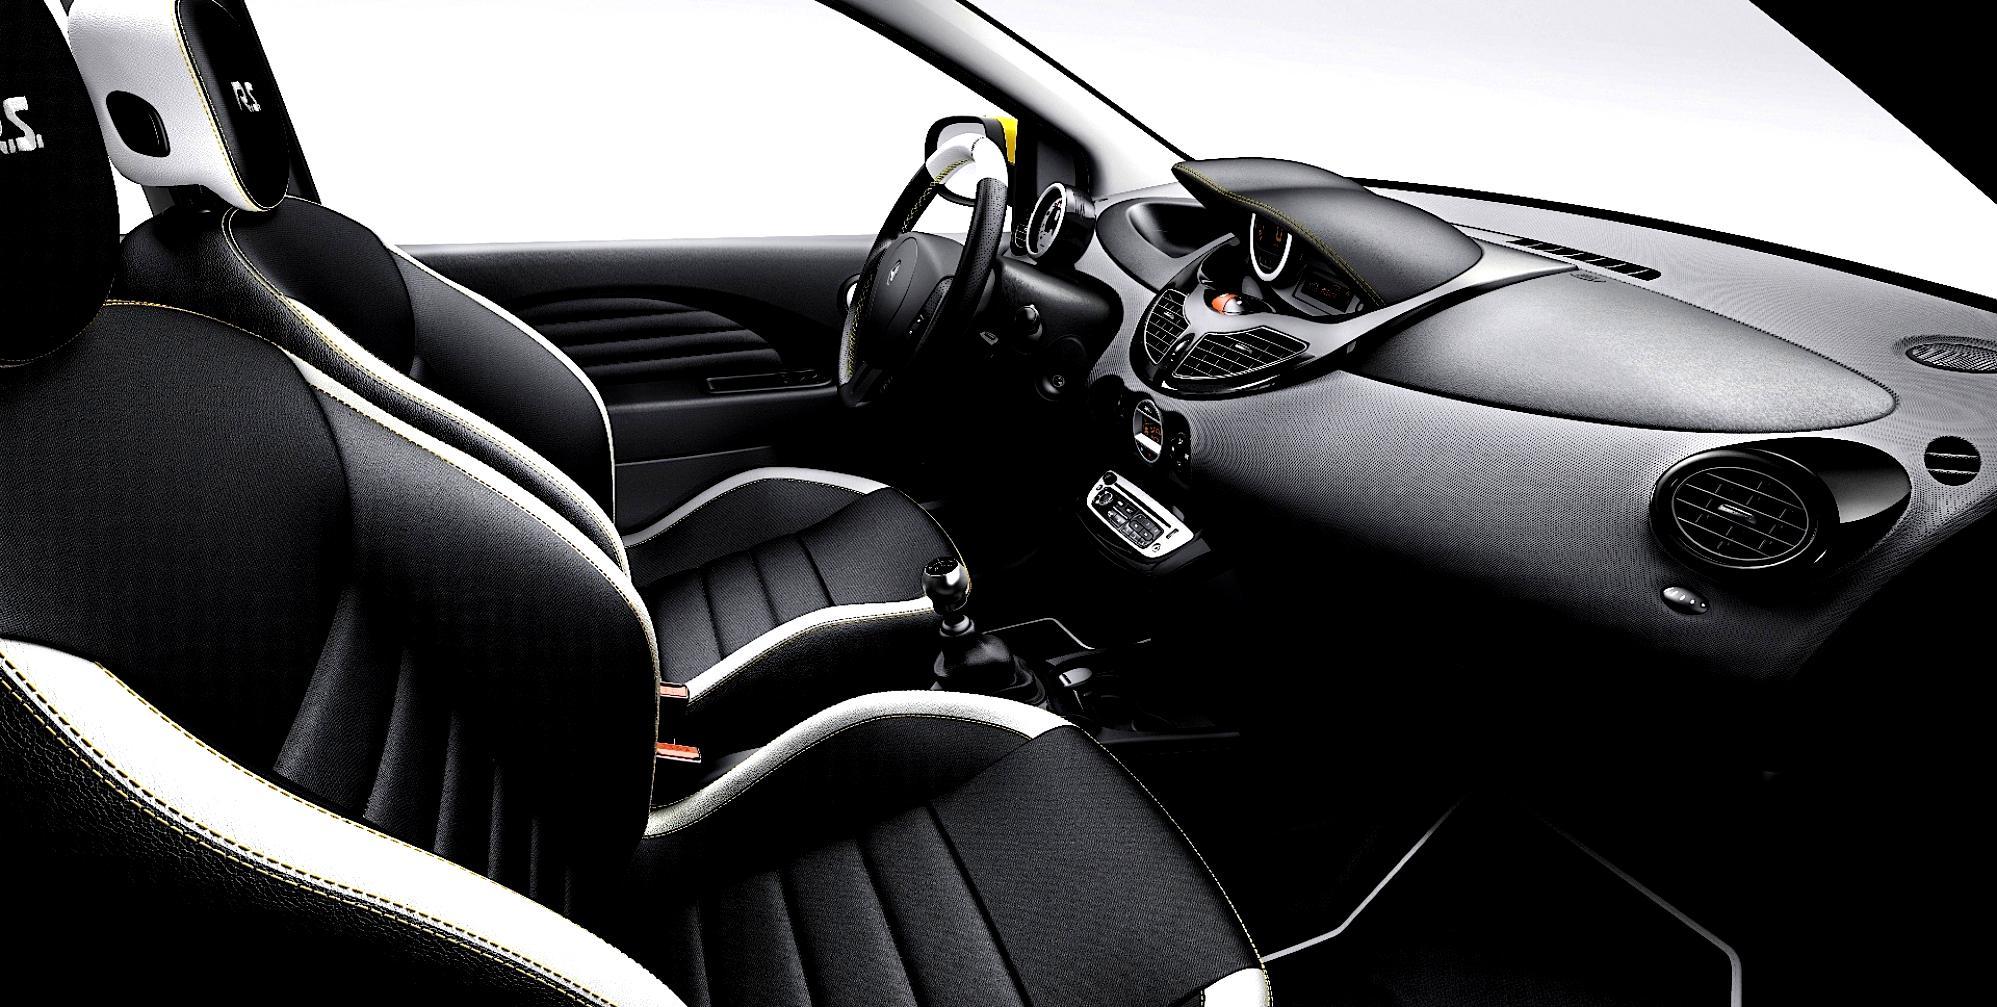 Renault Twingo RS 2011 on MotoImg.com